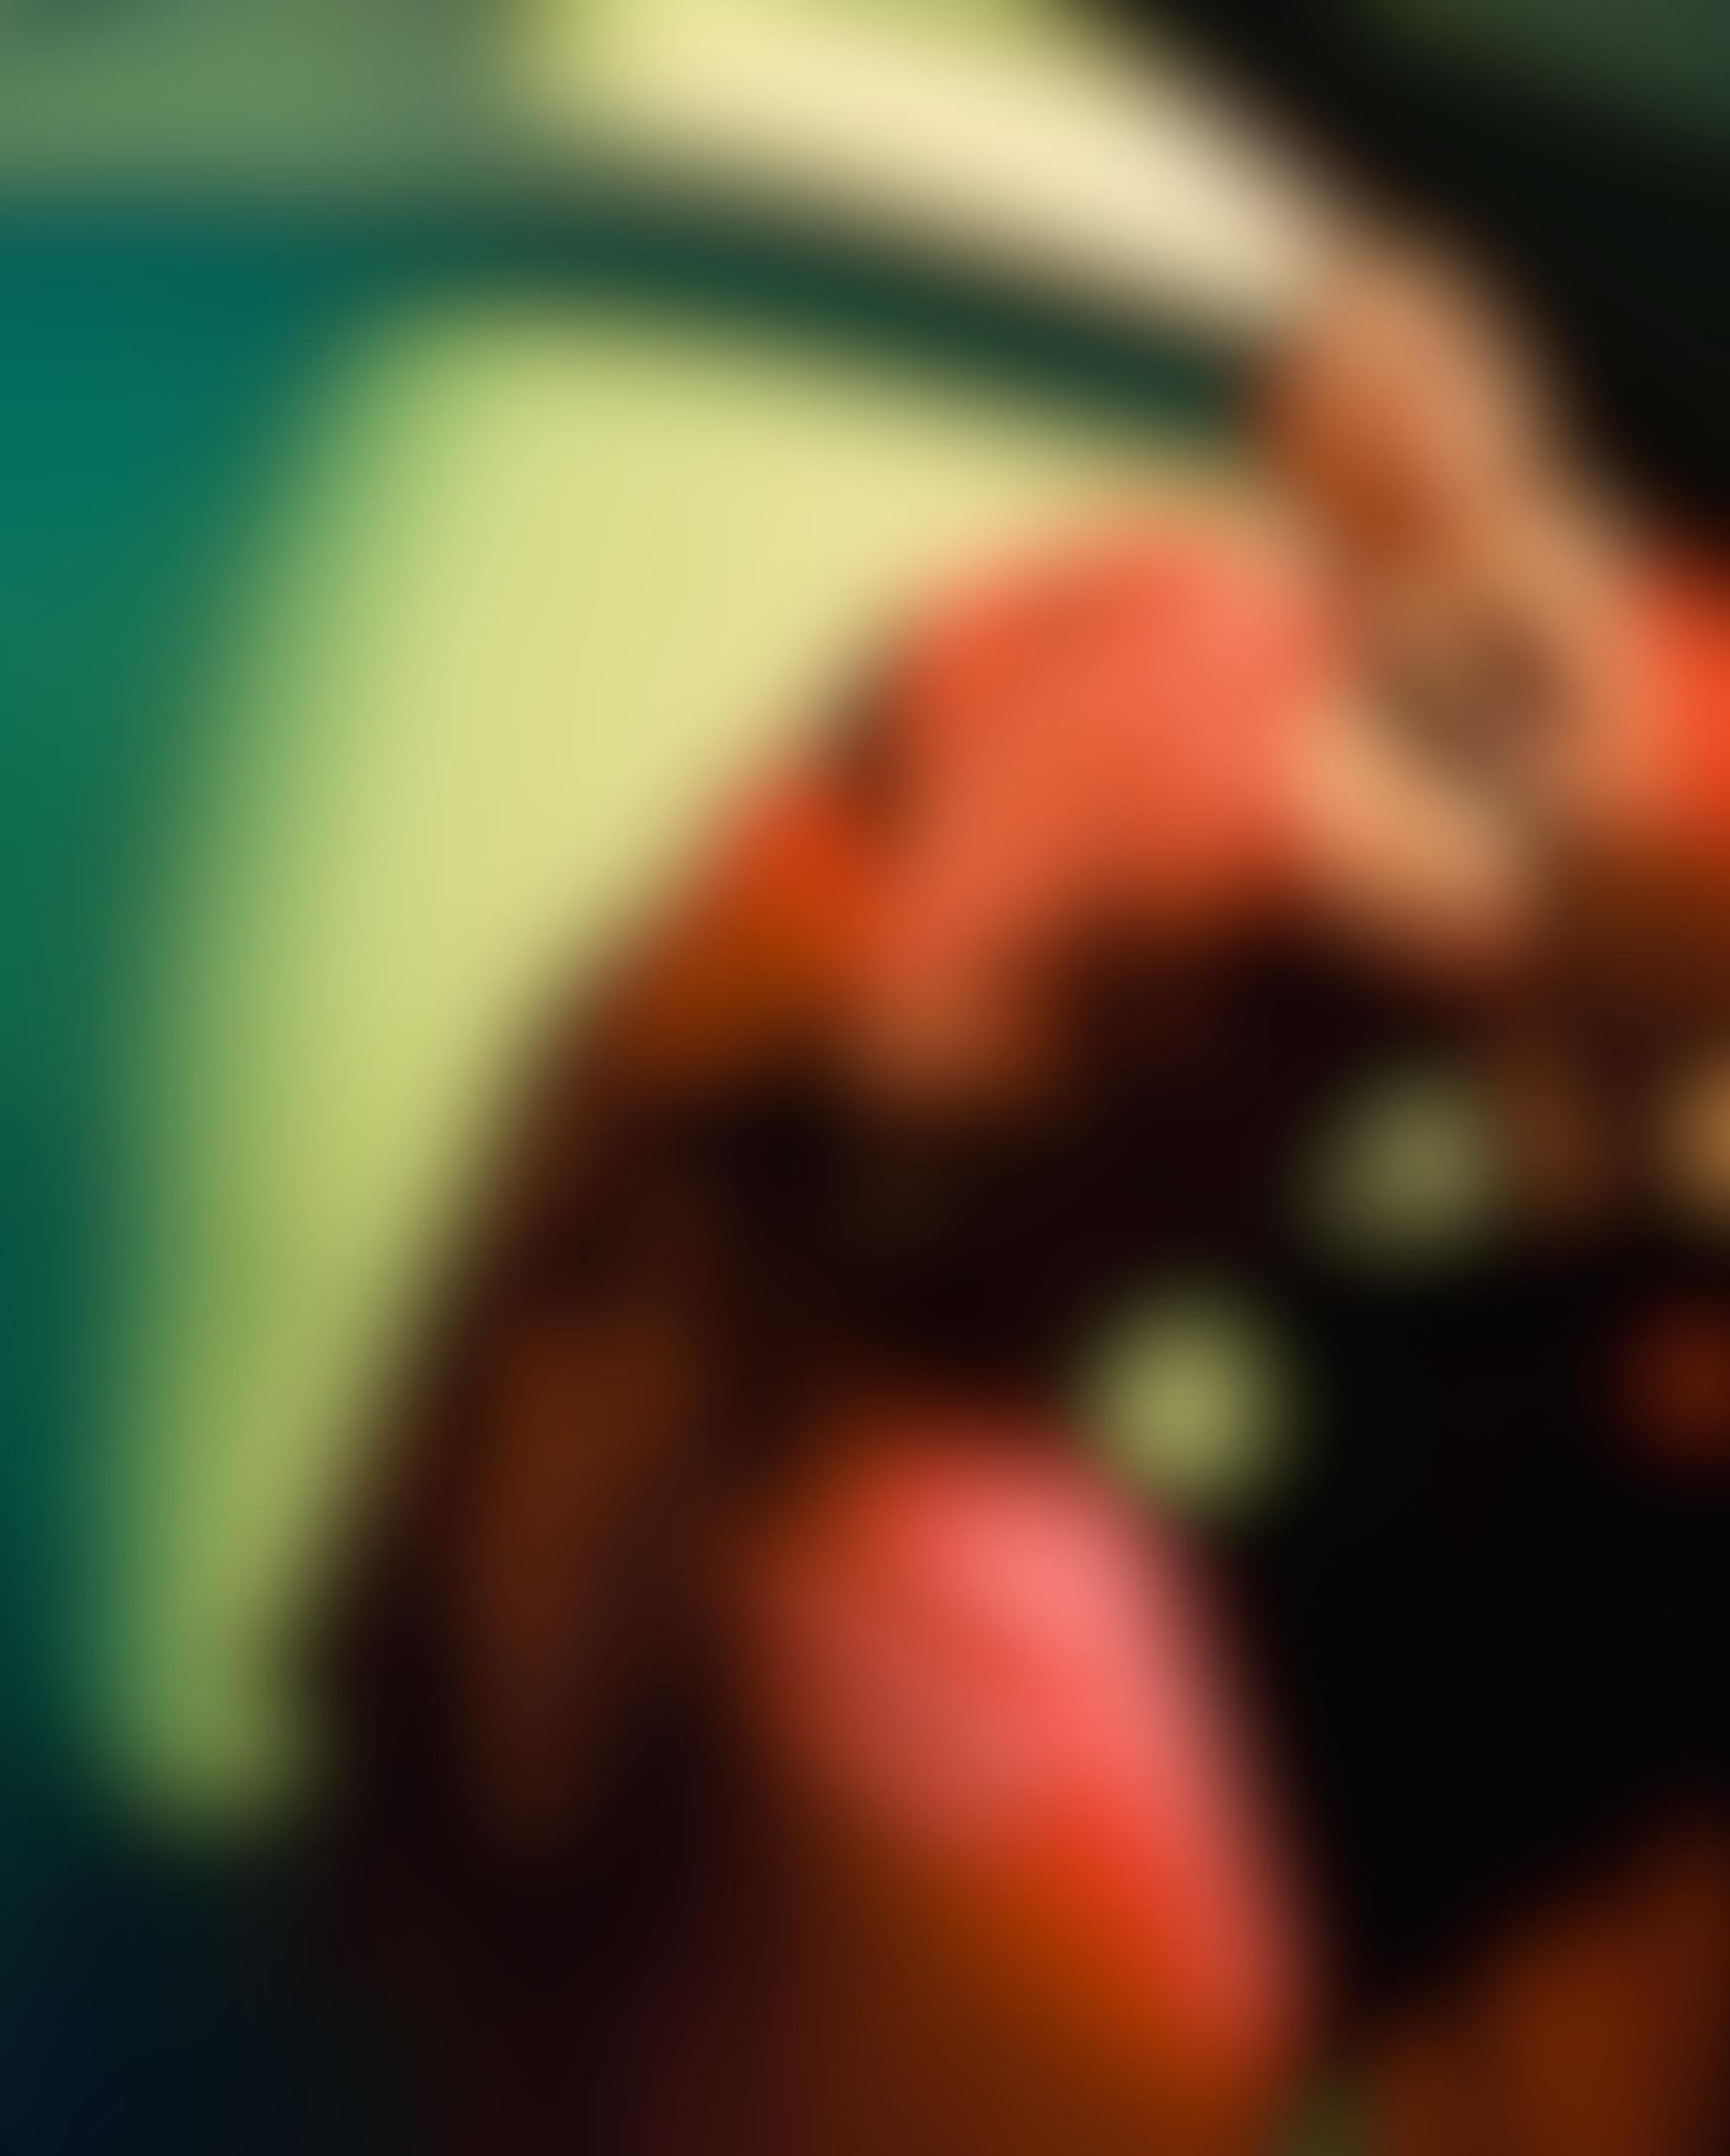 Joe puxley photographer pep talk creativelivesinprogress 001